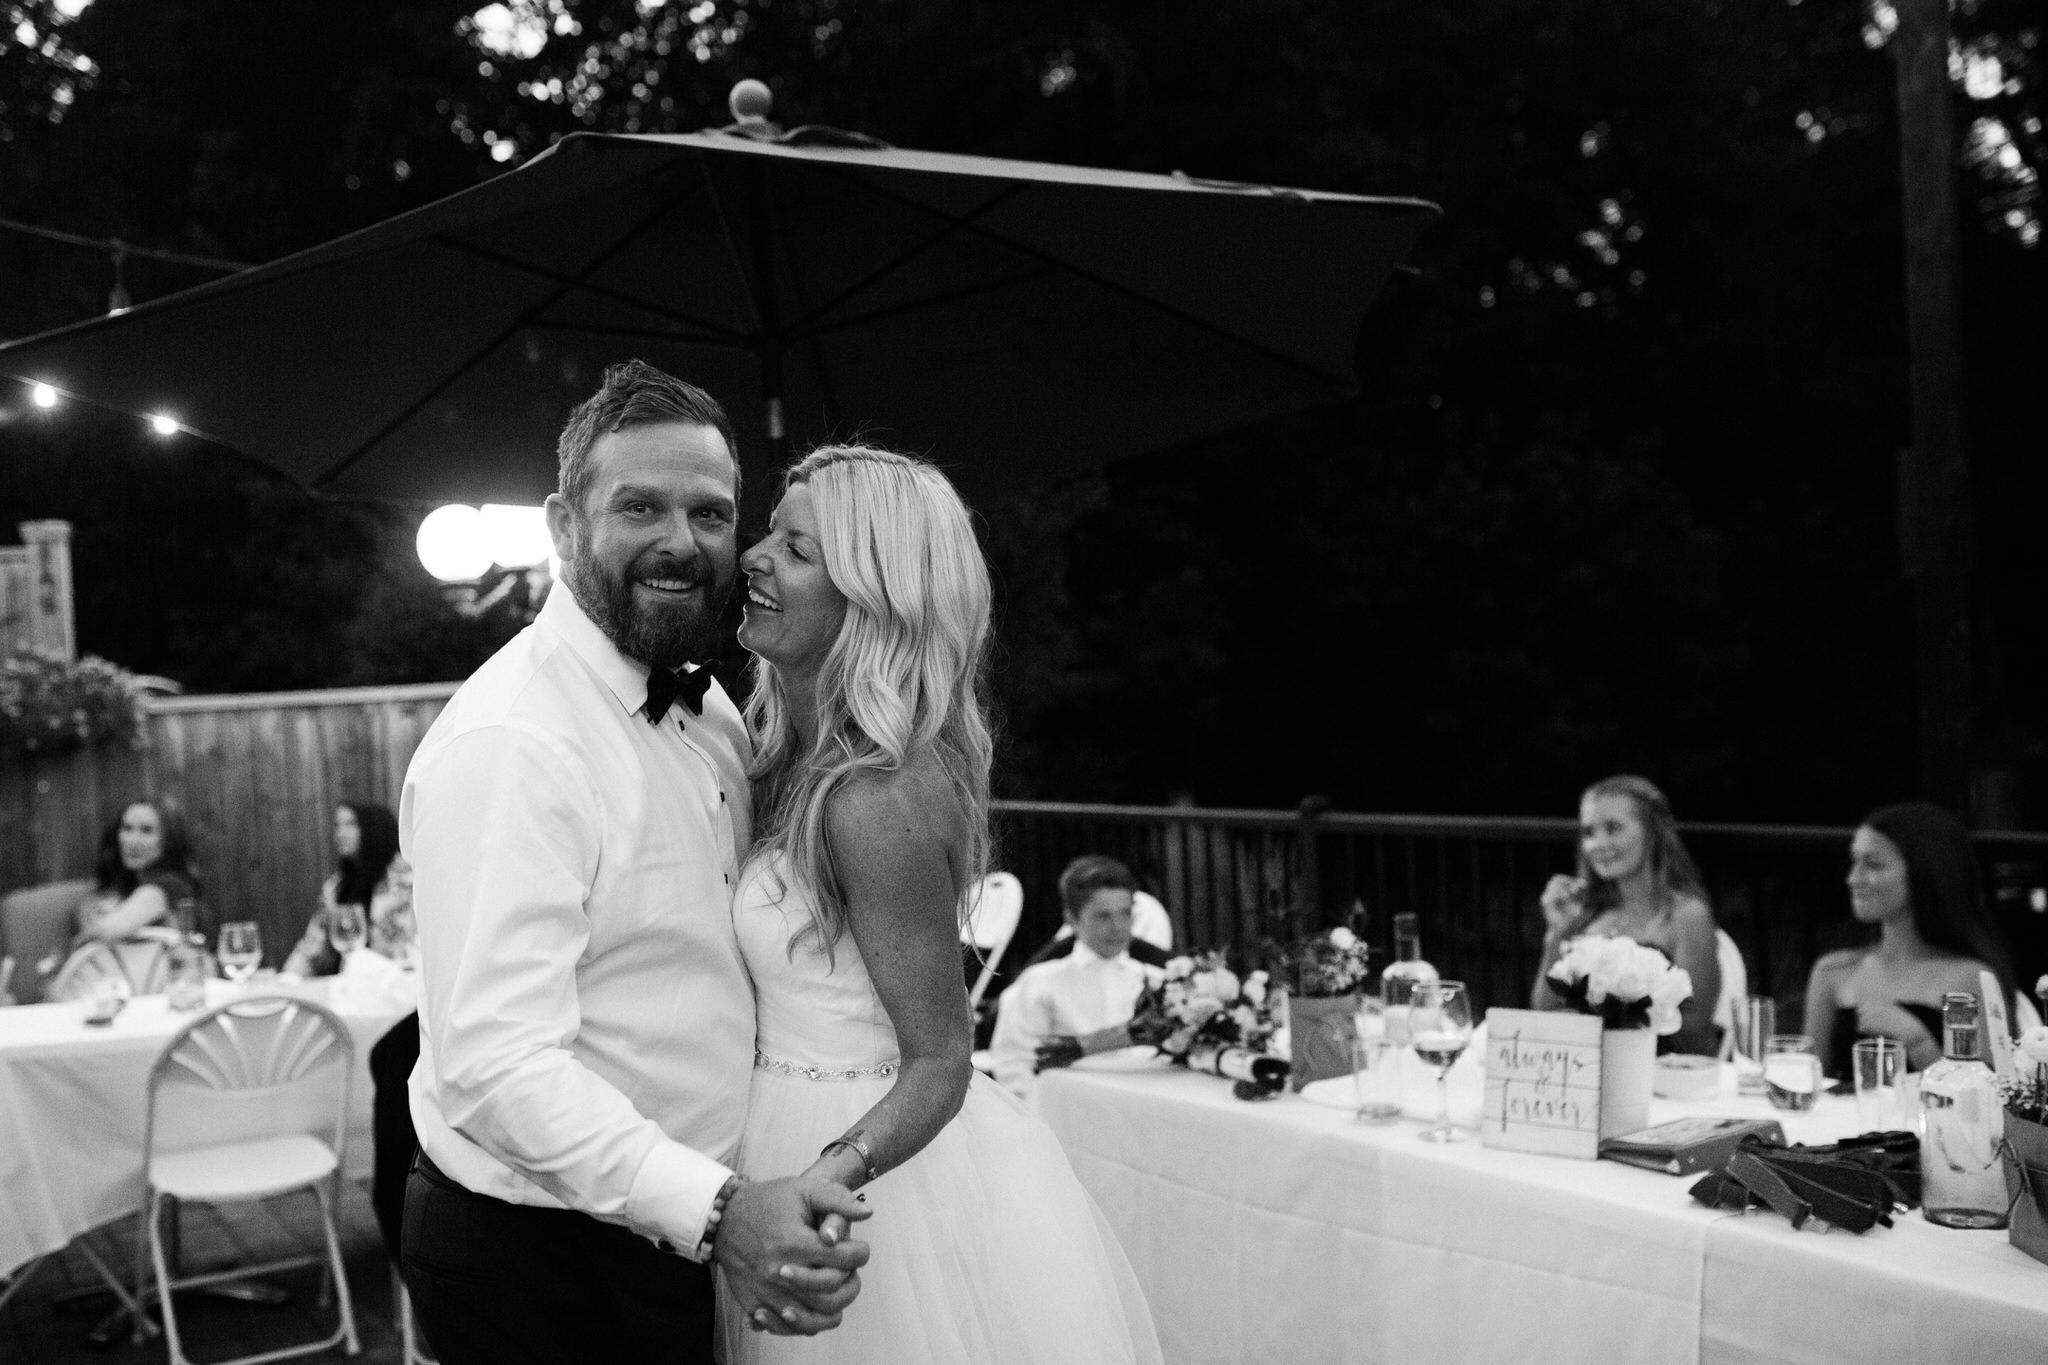 Harvest Restaurant Wedding Brooklin Ontario - Bride and groom's first dance